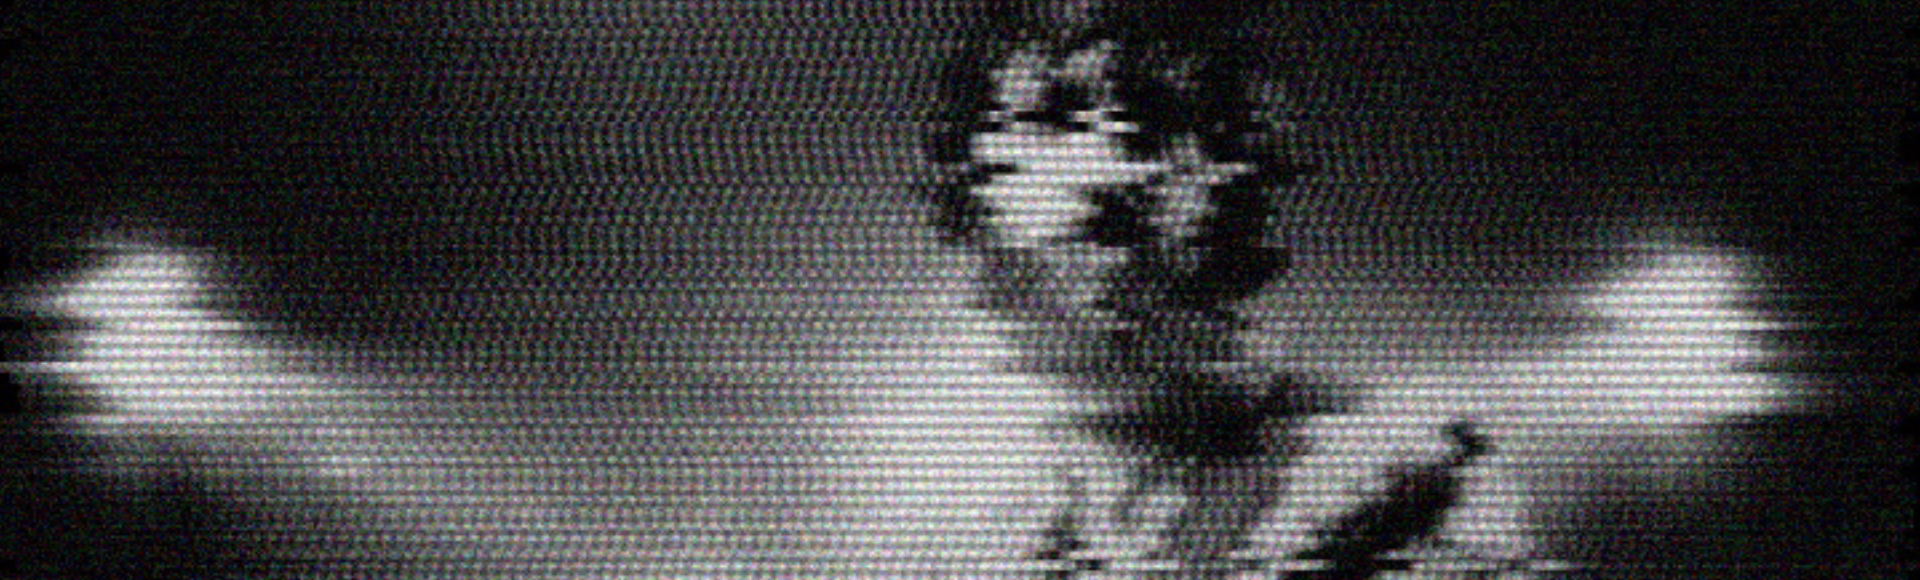 LP_Tsuns (0-00-12-05)_jpgm.jpg